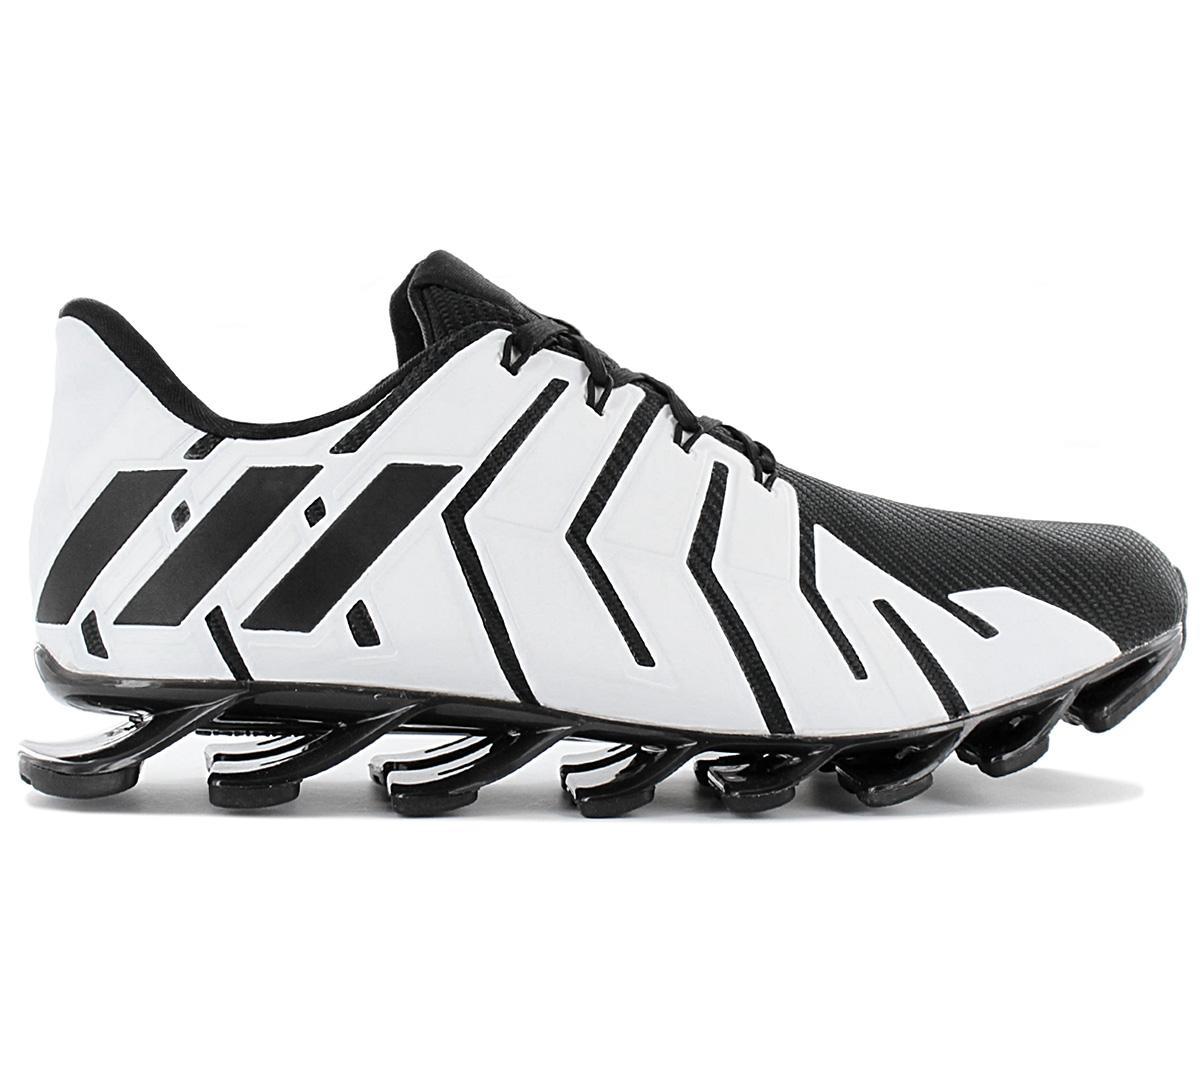 buy adidas springblade salg laws 0d4eb 62fd8